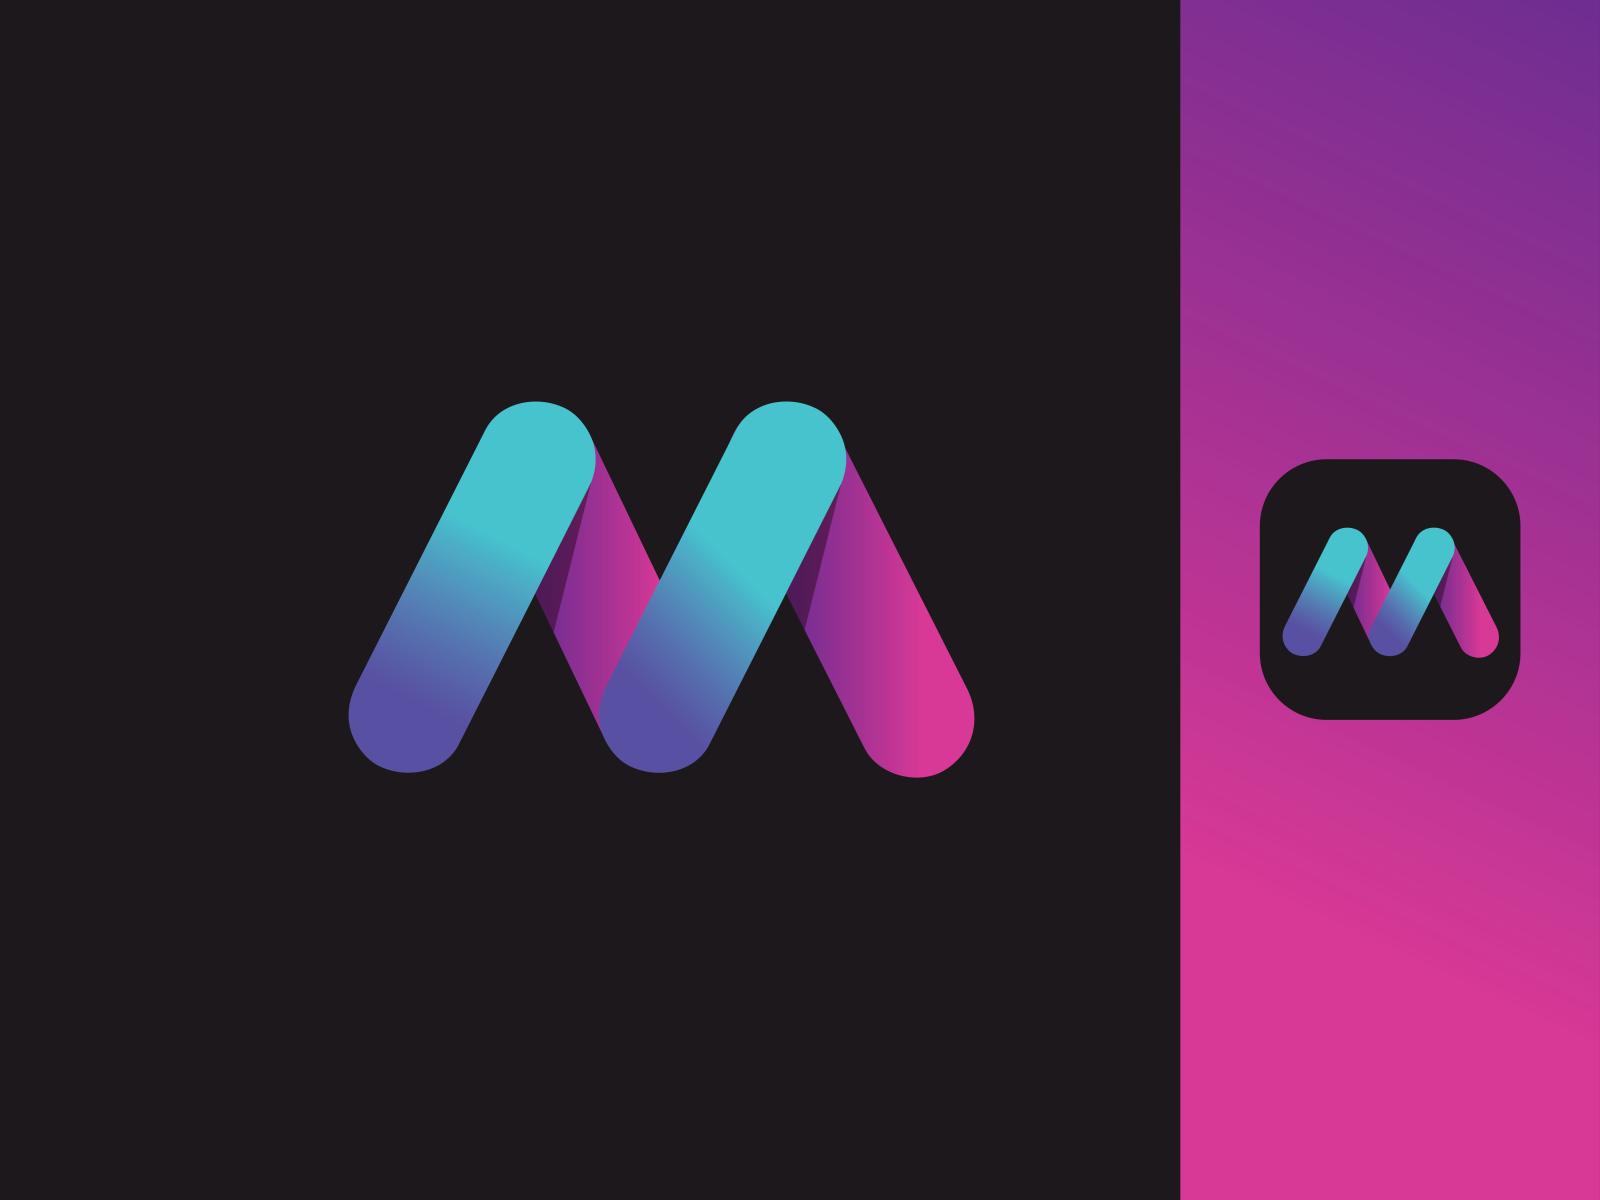 Letter M App Logo By Freelancer Saiful On Dribbble